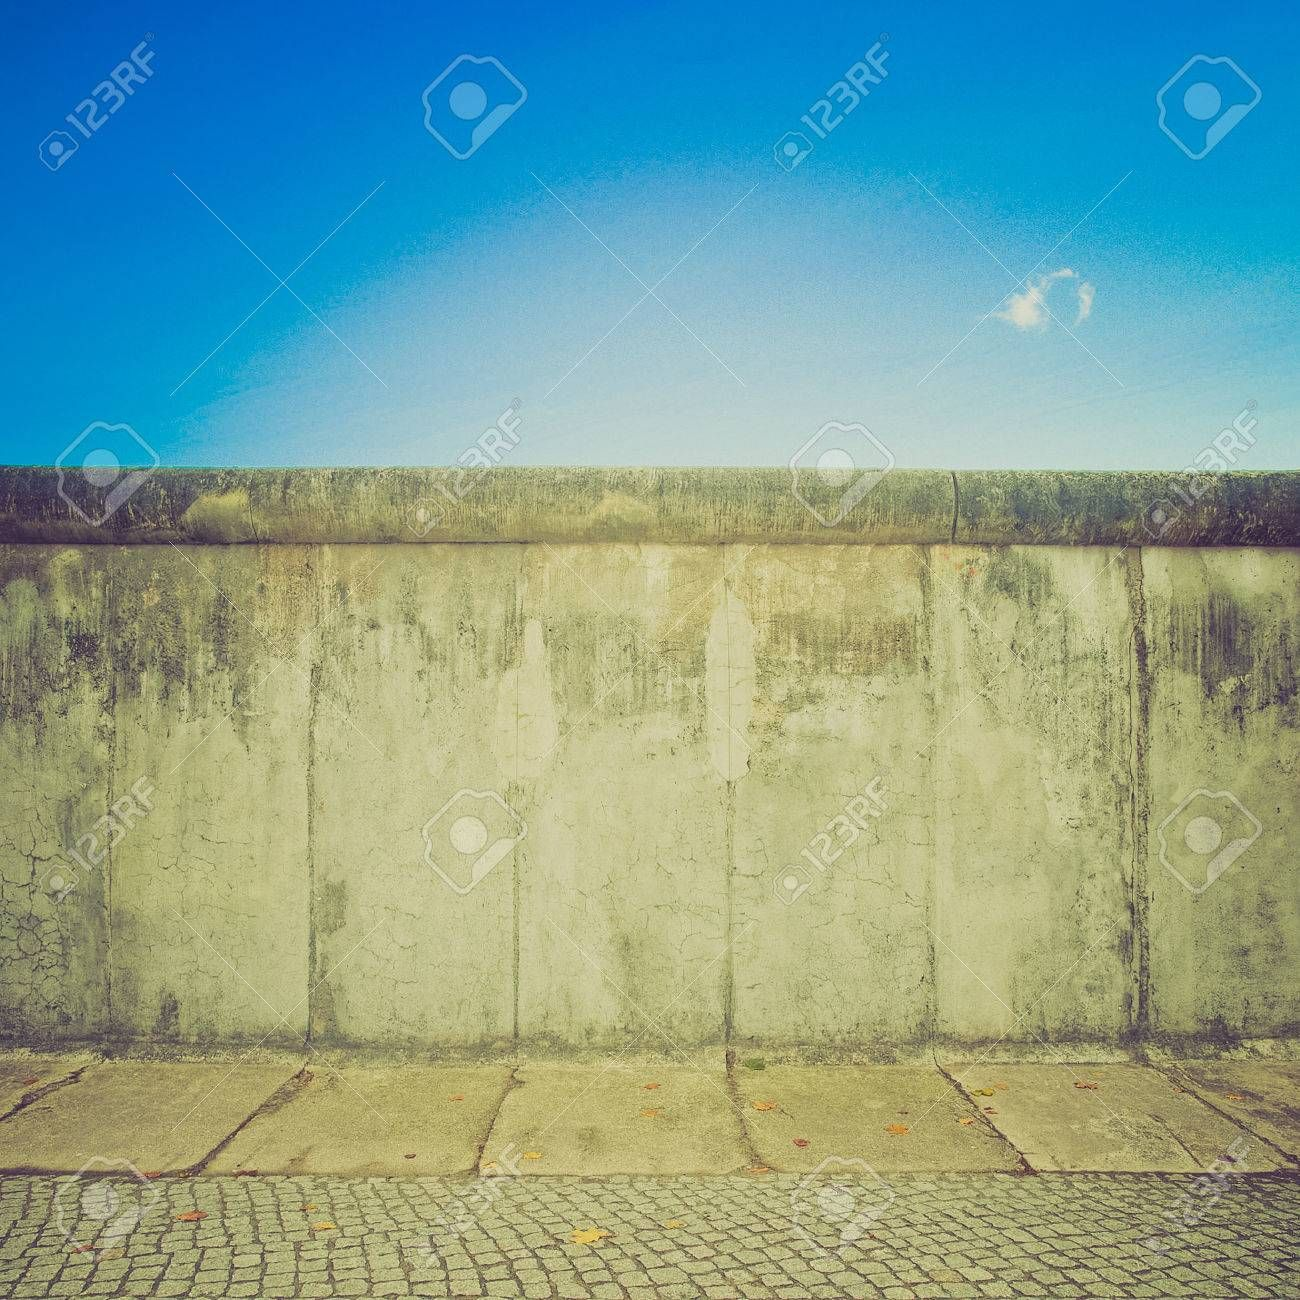 Vintage Looking The Berlin Wall Berliner Mauer In